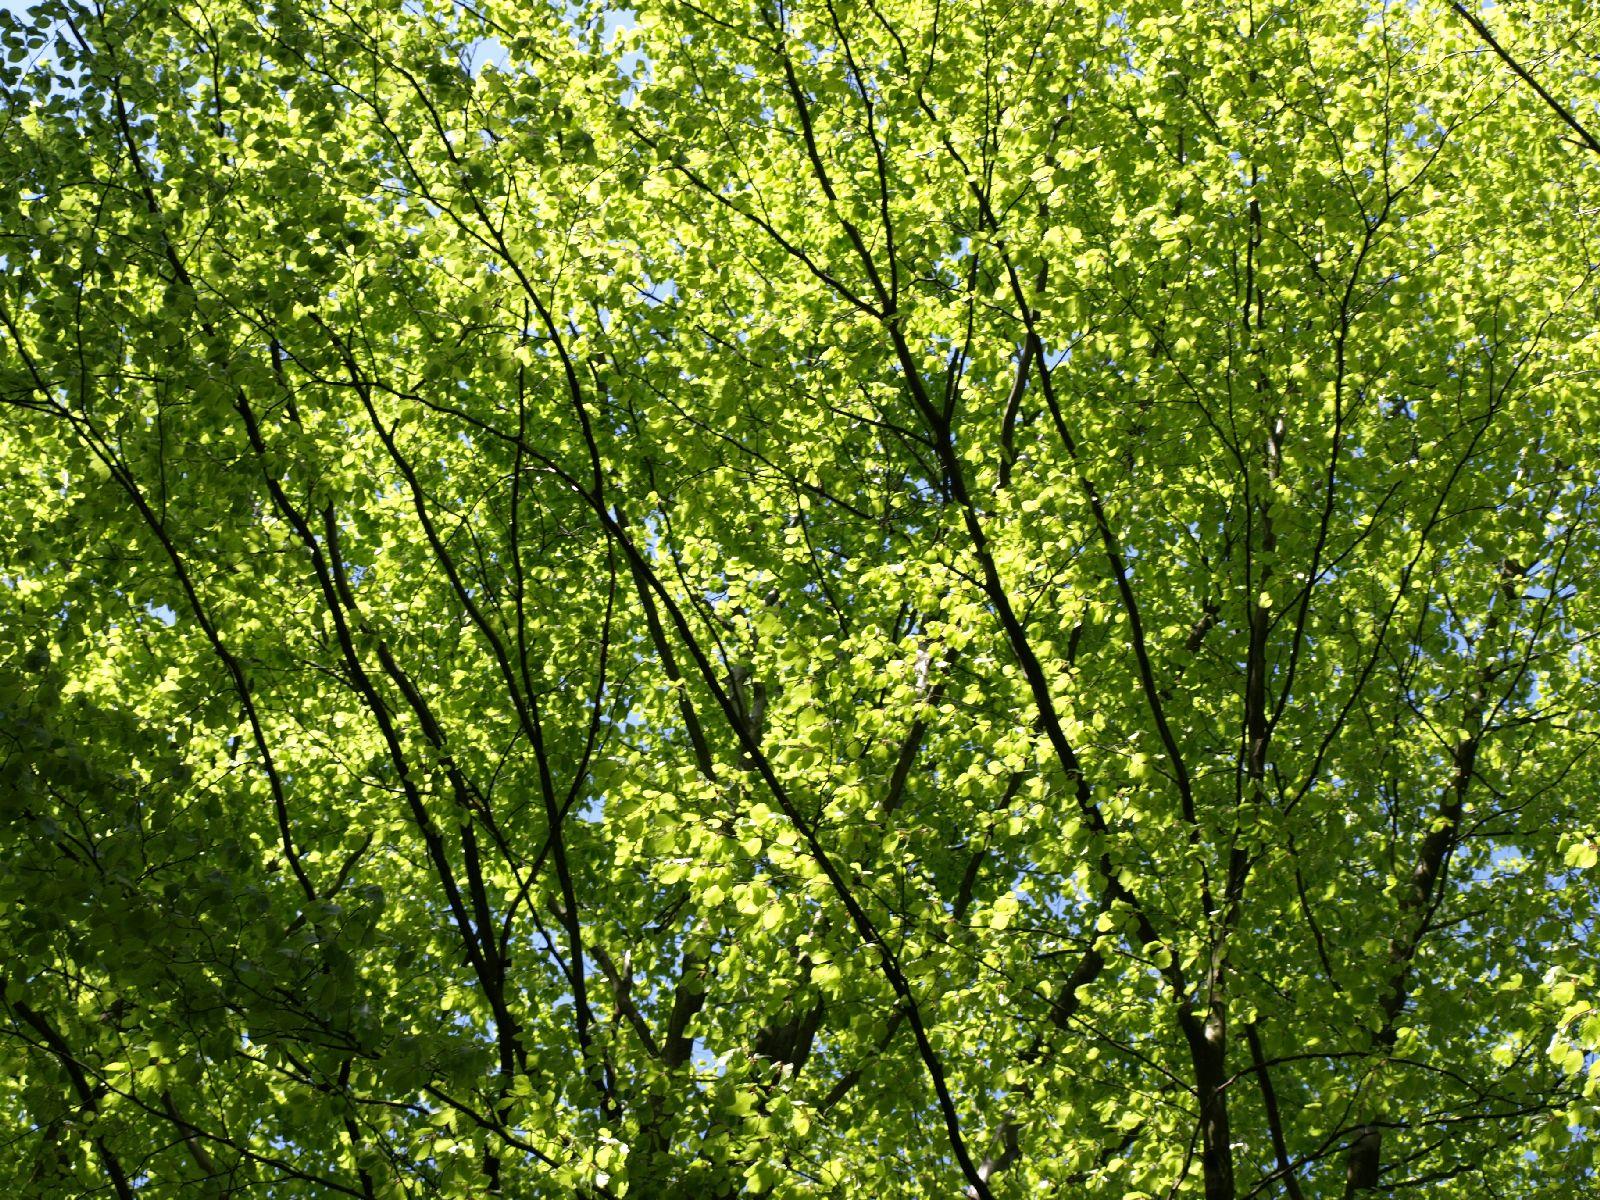 Plants-Trees_Photo_Texture_B_P5042461